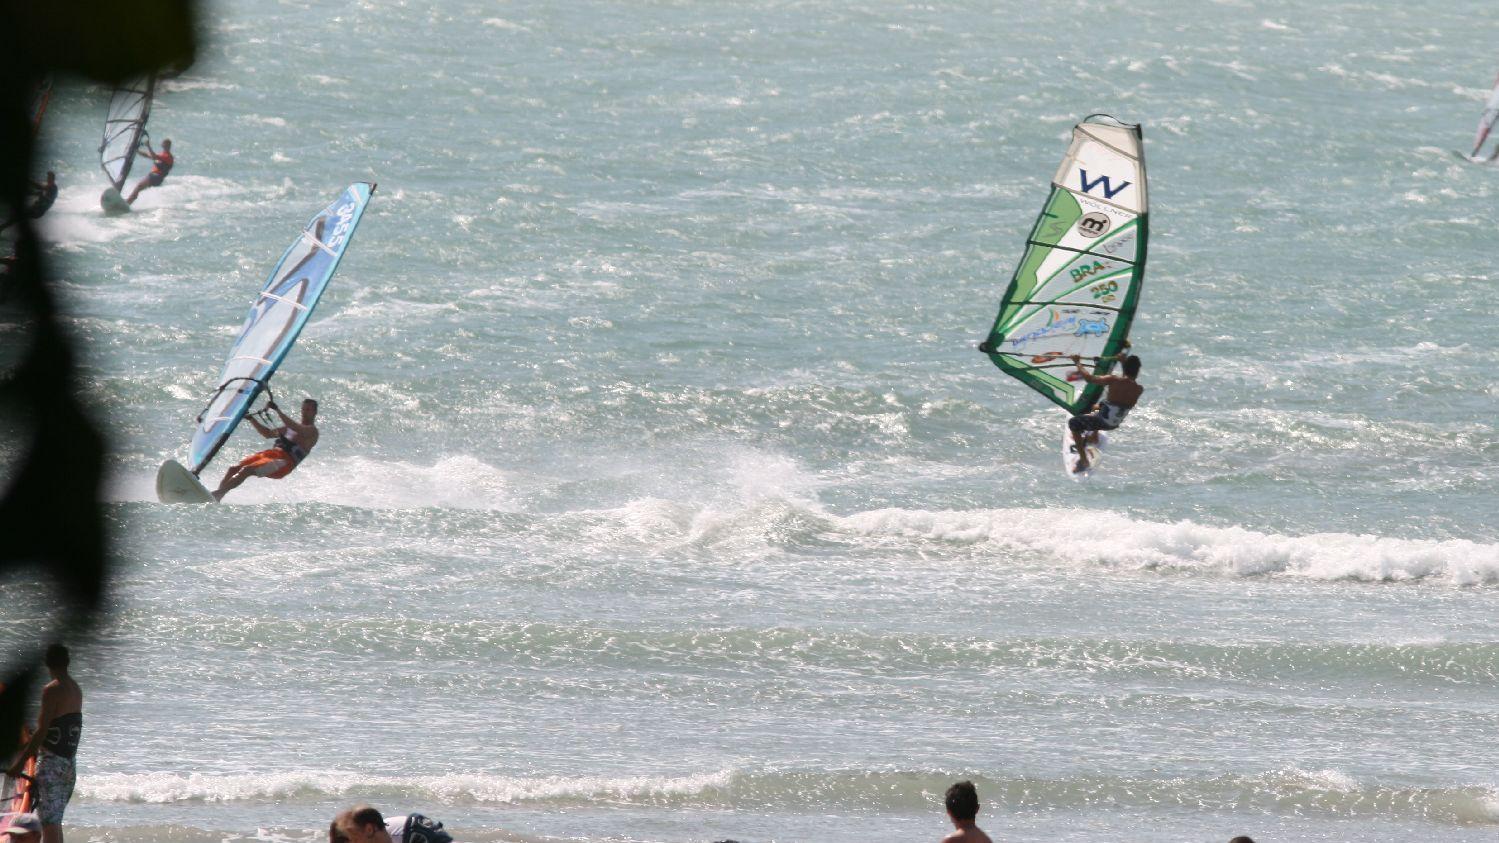 Windsurfen_Jericoacoara_IMG_1229.JPG